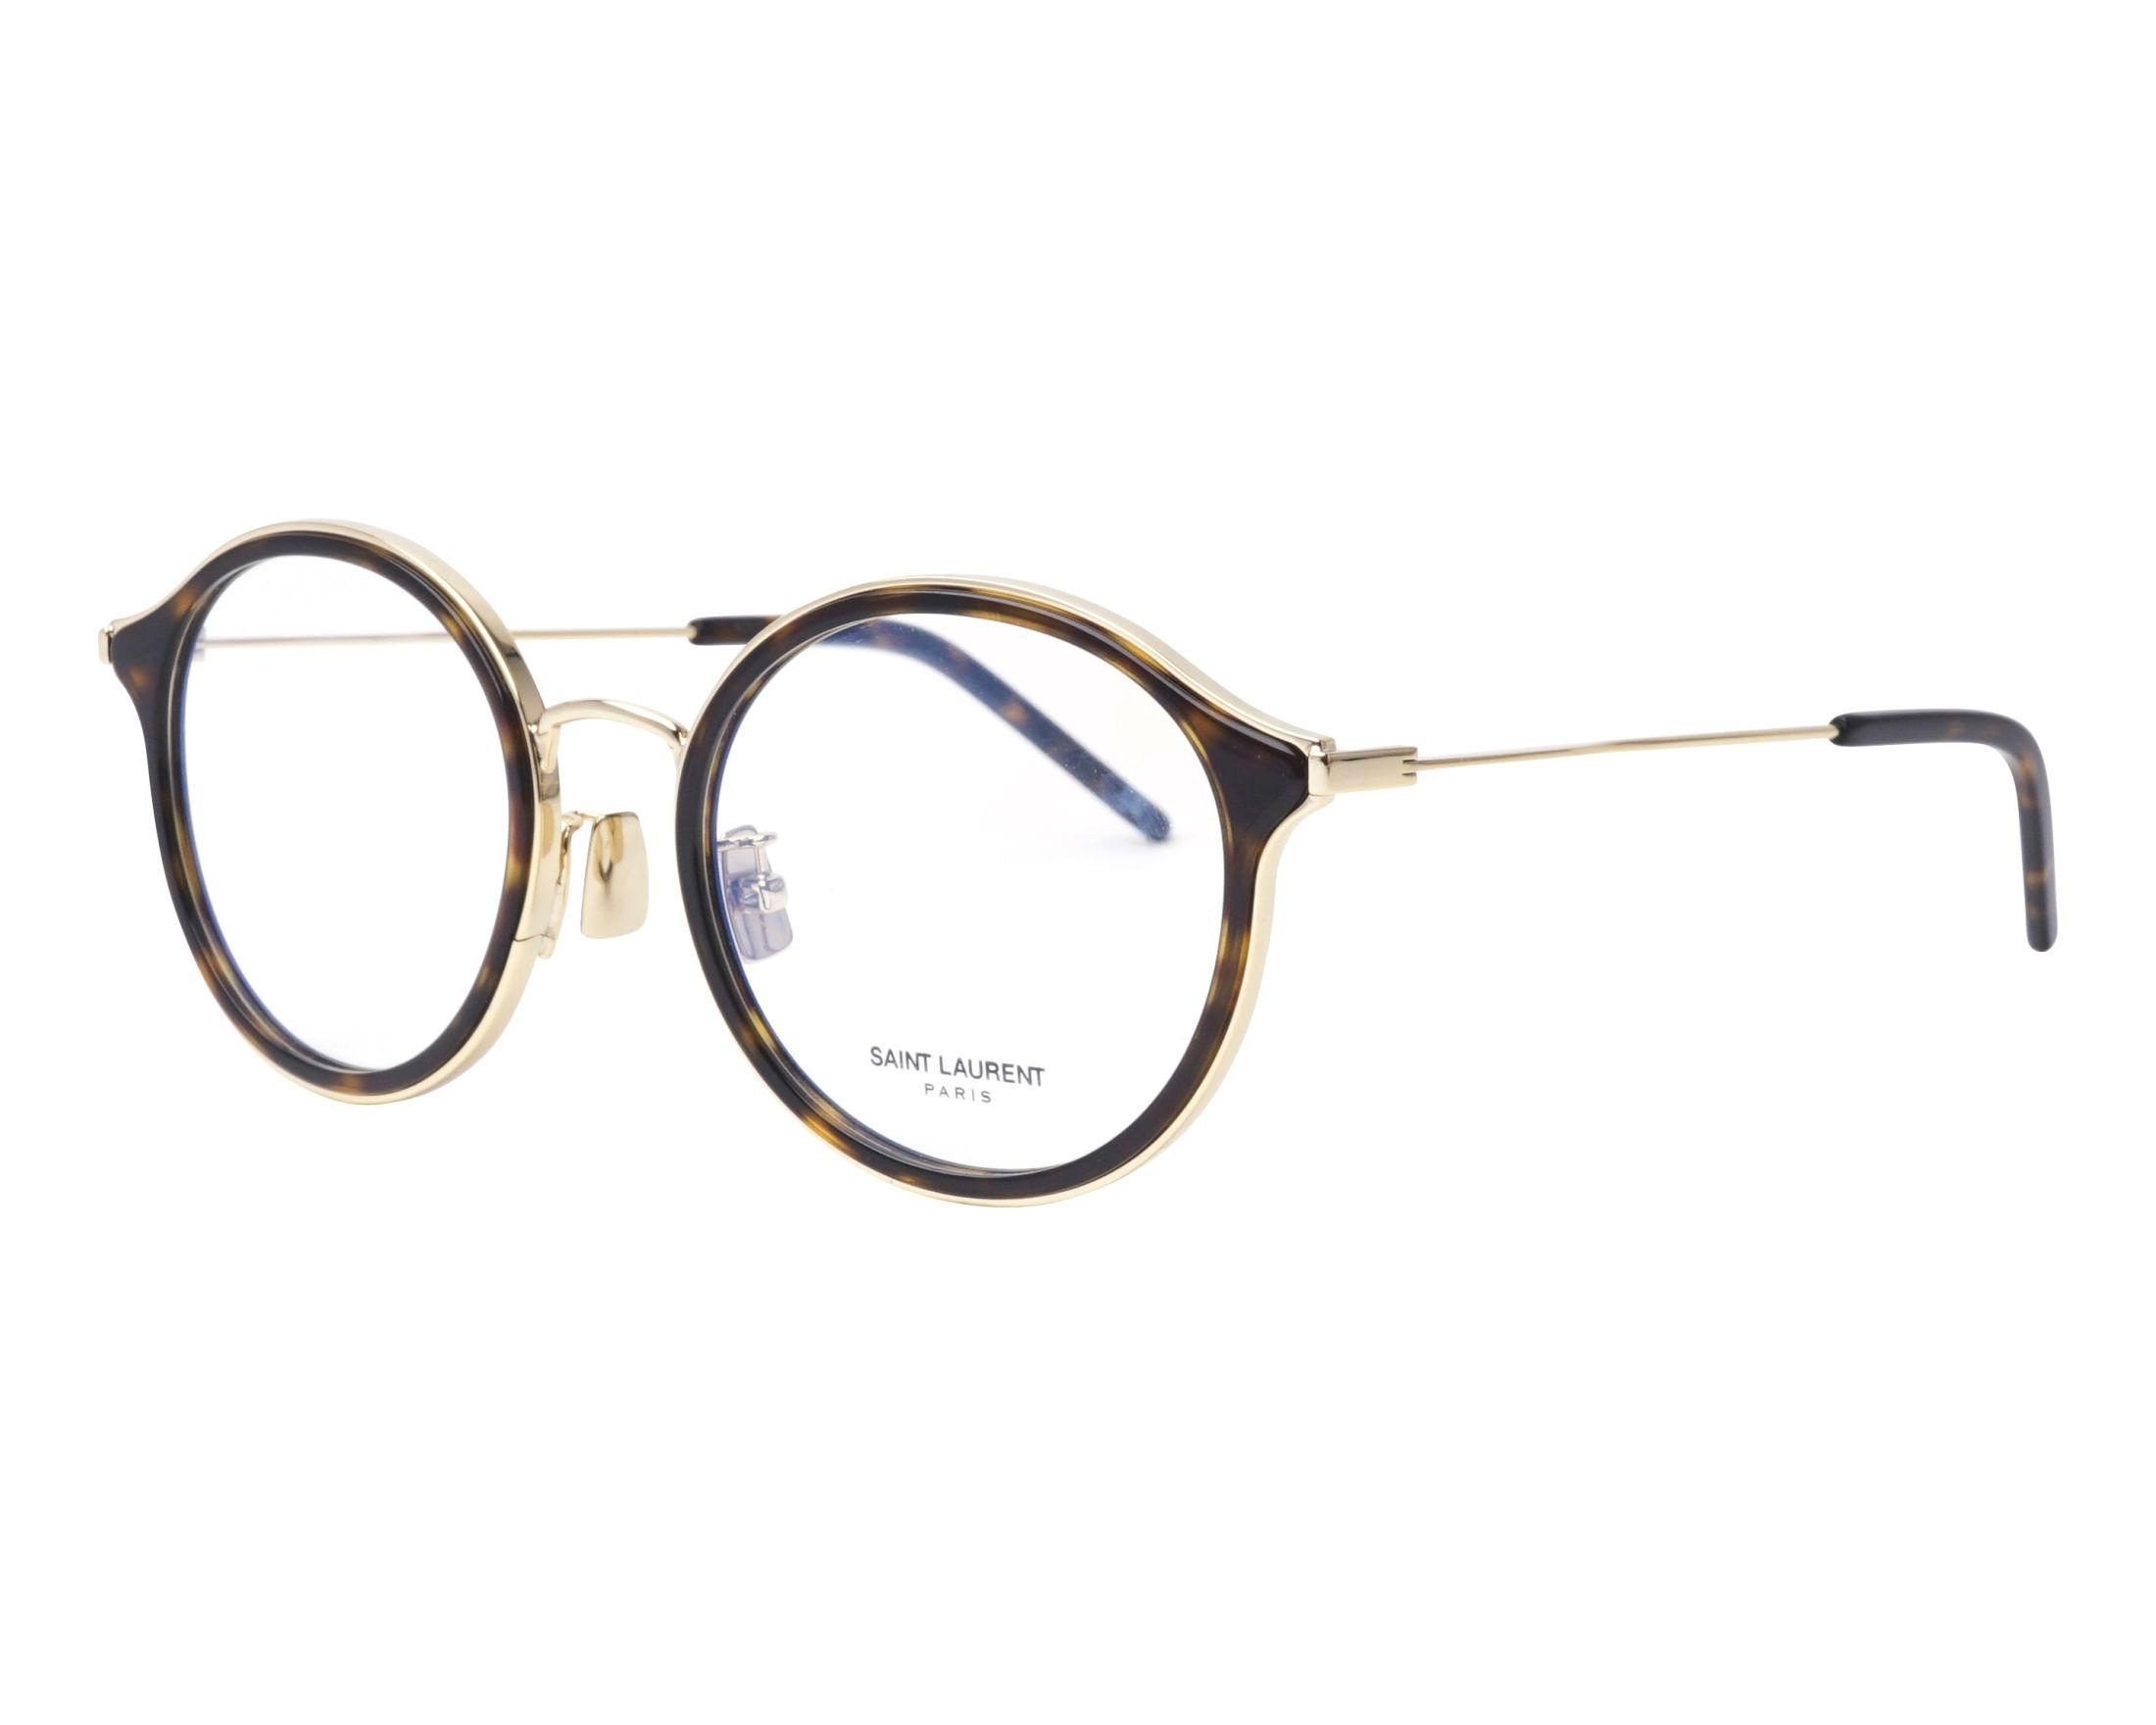 8f436f69d95 eyeglasses Yves Saint Laurent SL-234-F 003 52-21 Havana Gold profile